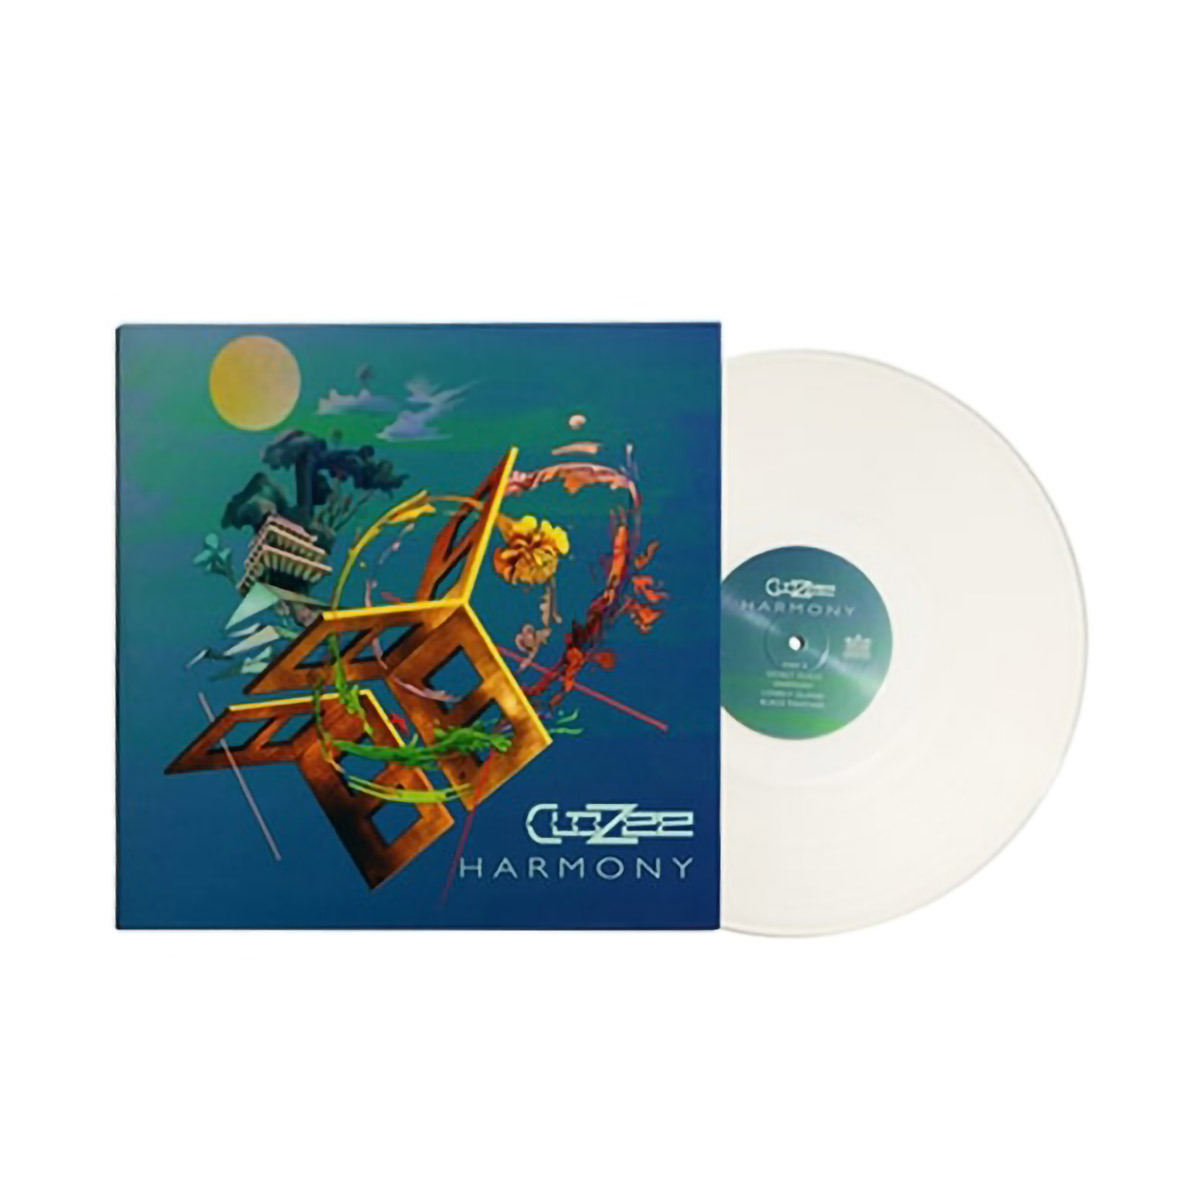 "Harmony EP – Limited Edition 12"" Vinyl"